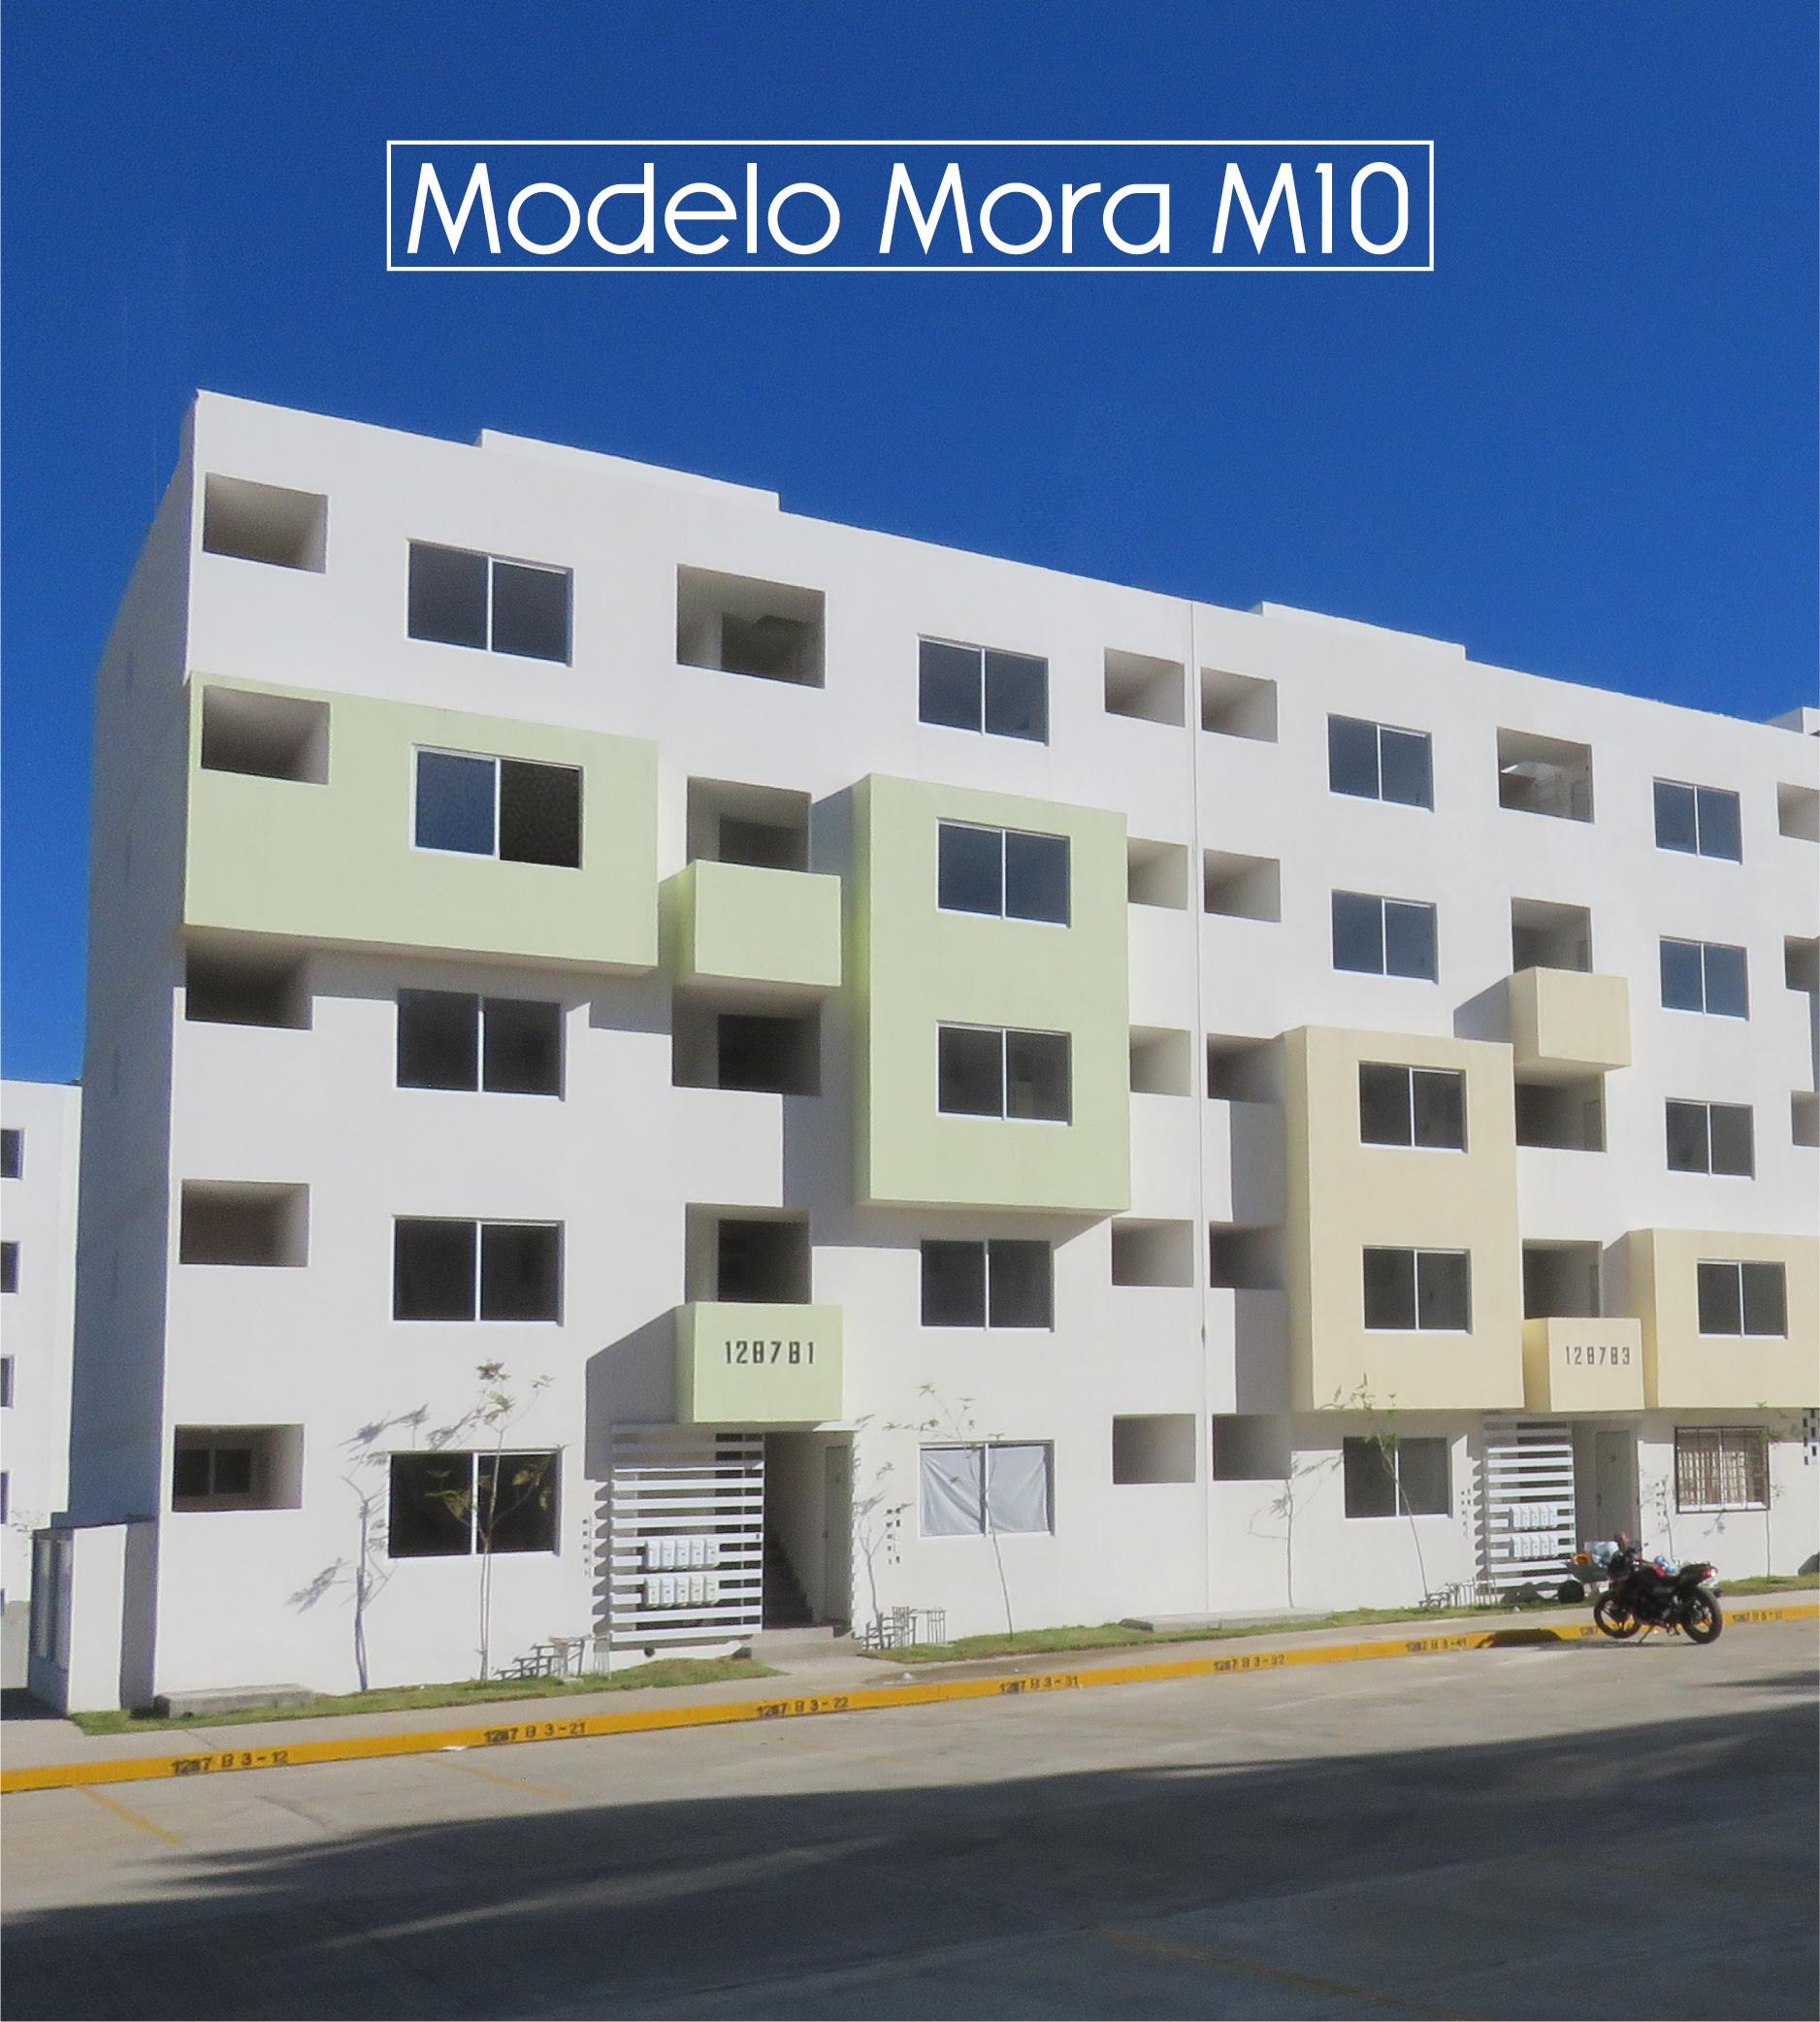 Modelo Mora M10